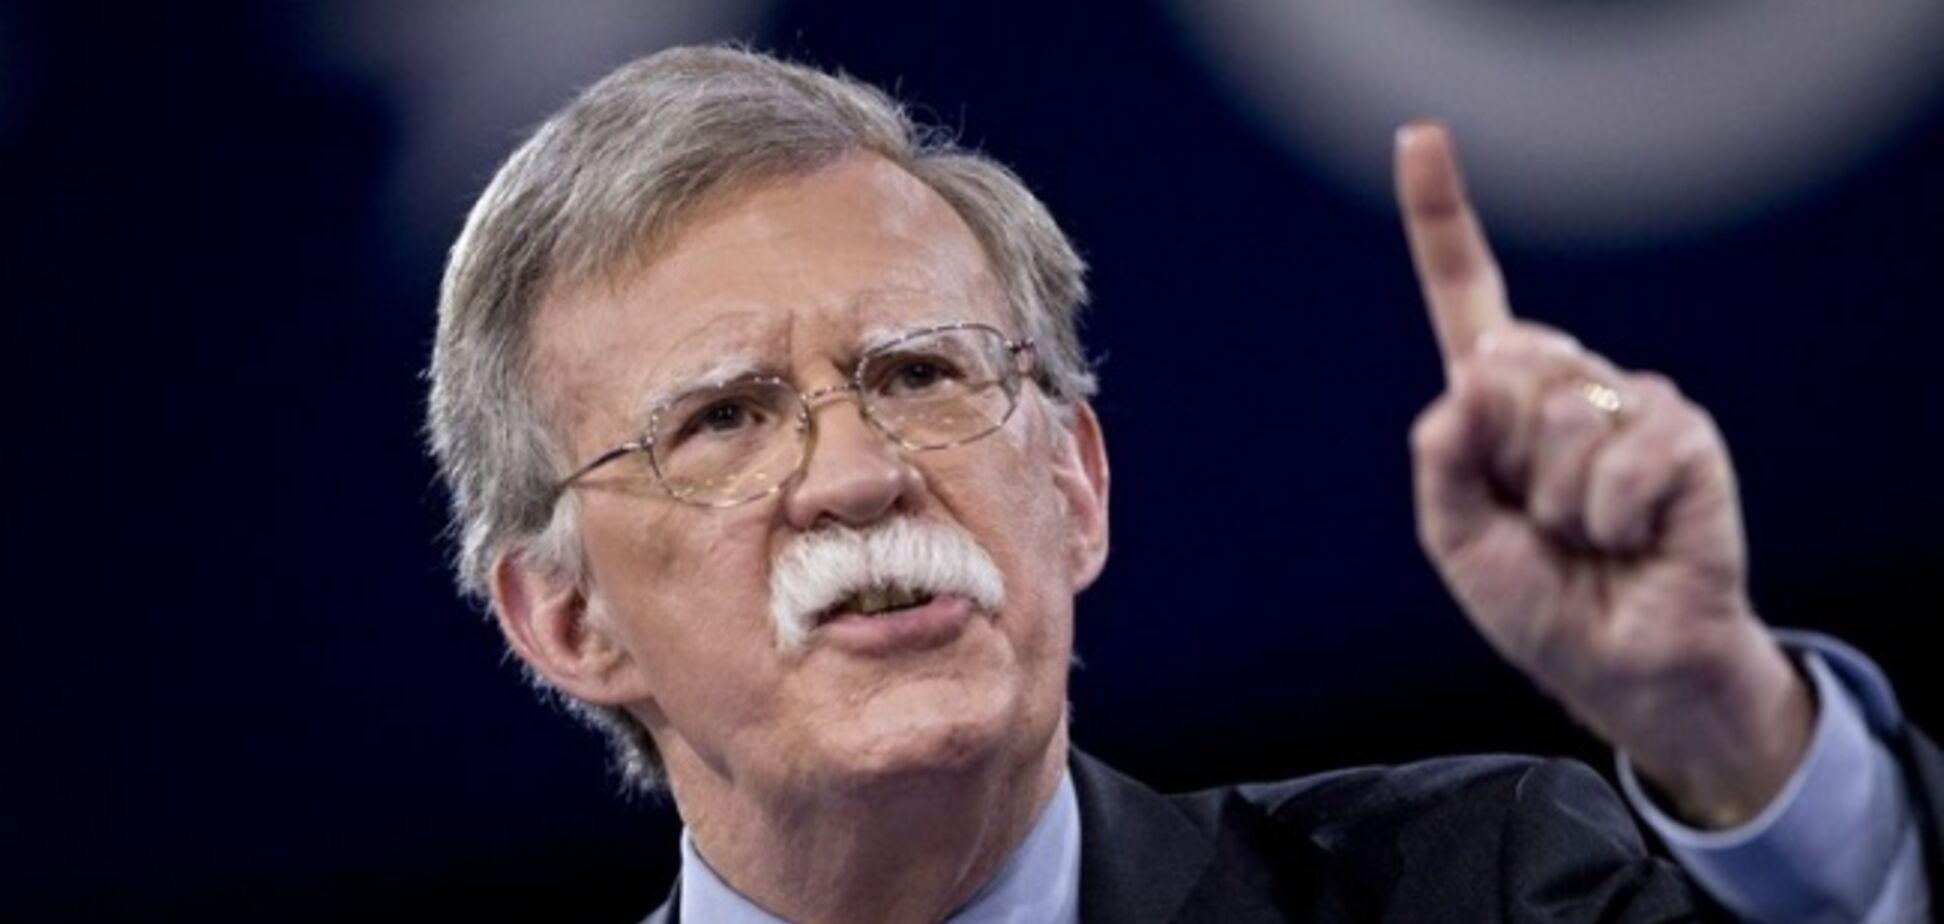 'Стоятимемо разом!' США звернулися із потужним посилом до України